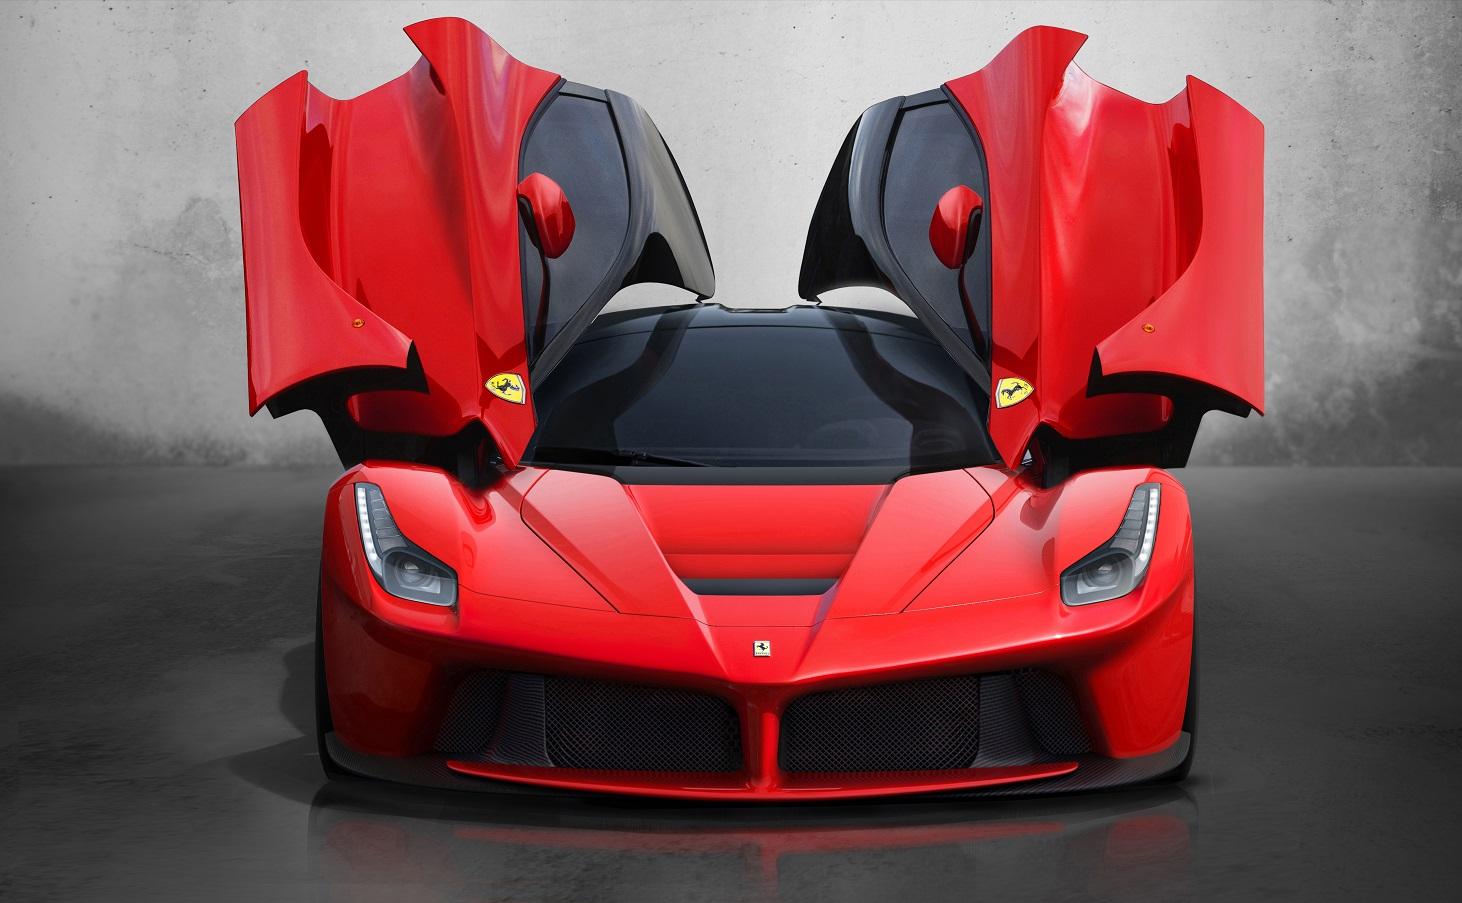 Red Ferrari with vertically-opening side doors open.